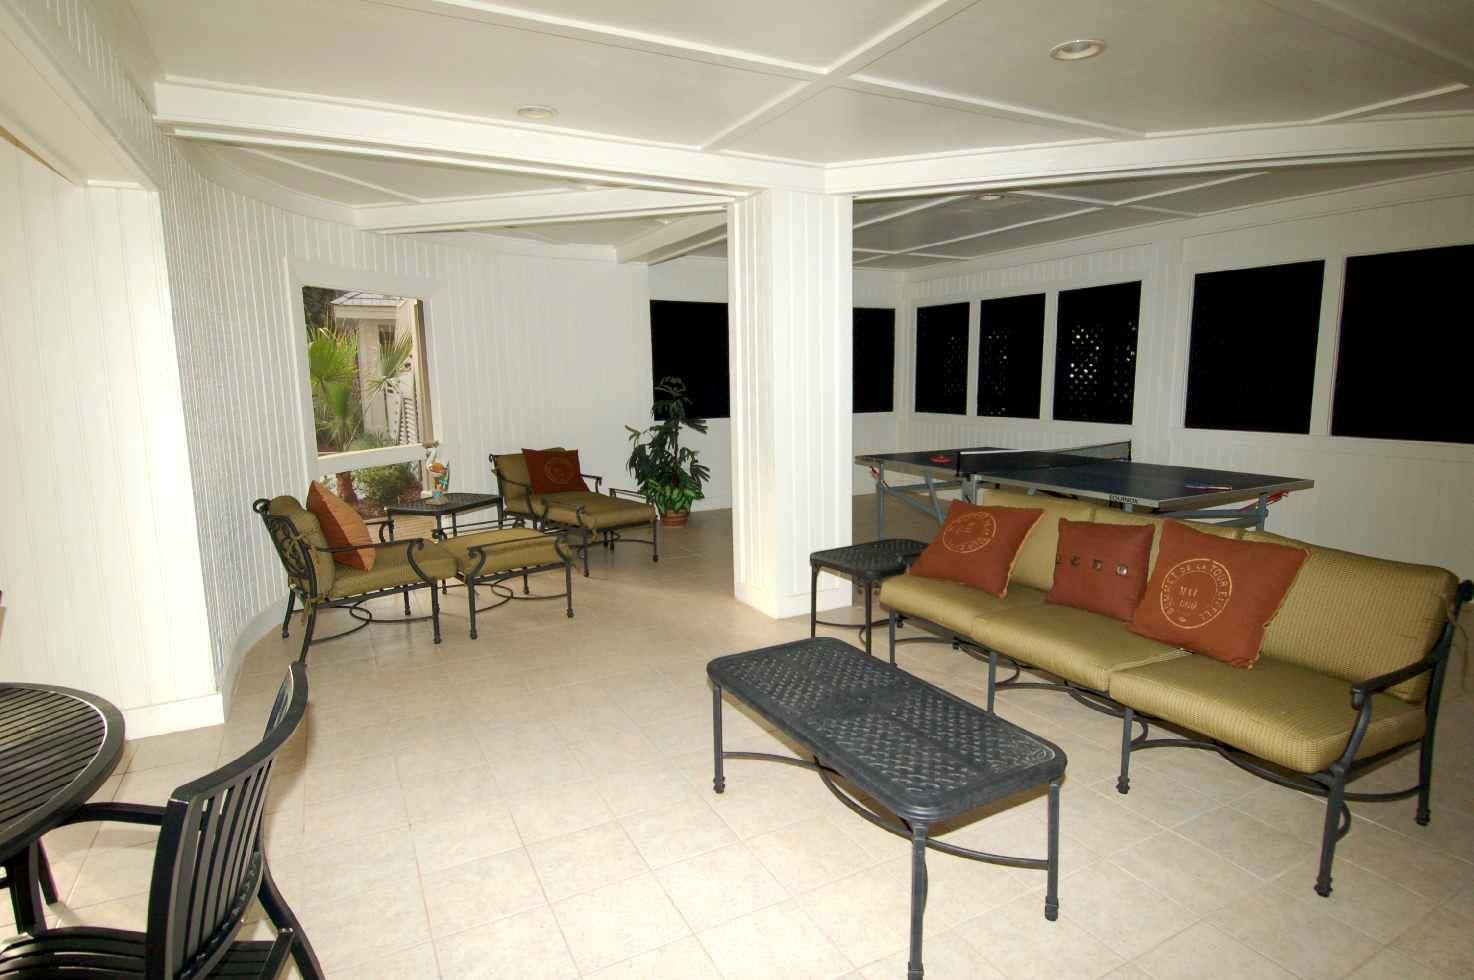 Pin by The Vacation Company on 10 Brigantine Hilton Head